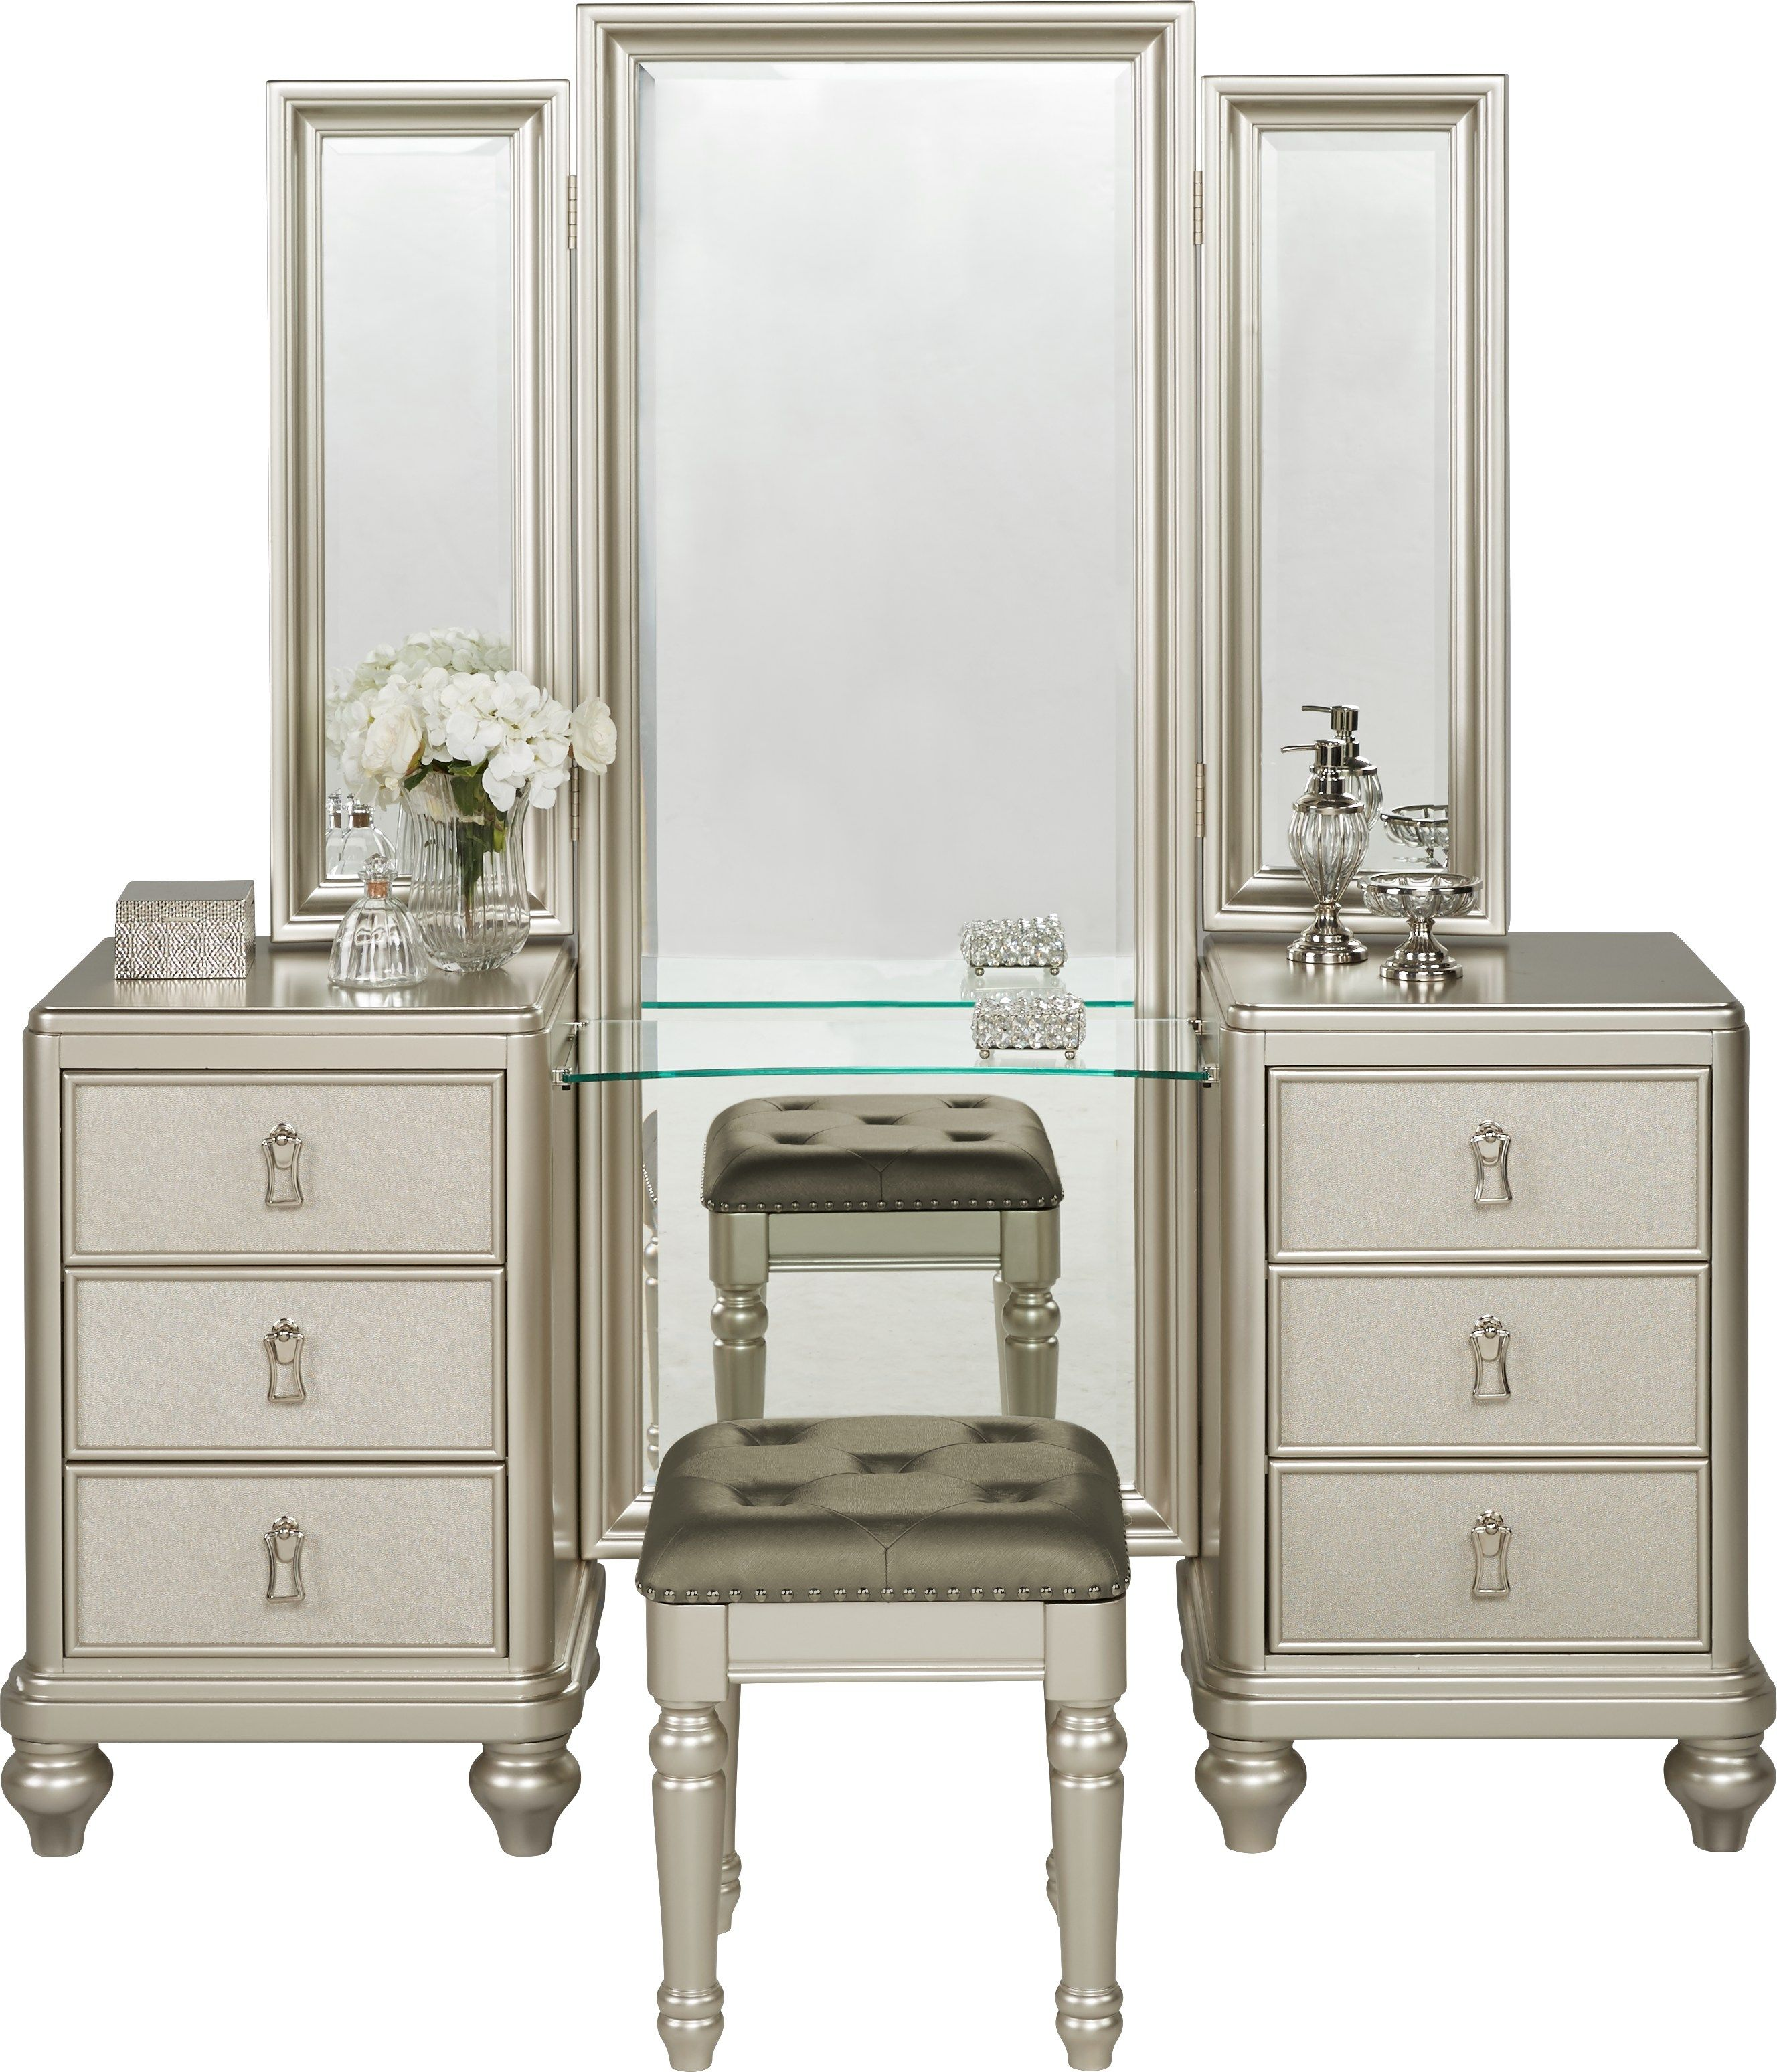 Sofia Vergara Paris Silver 2 Pc Vanity Set Bedroom Vanity Set